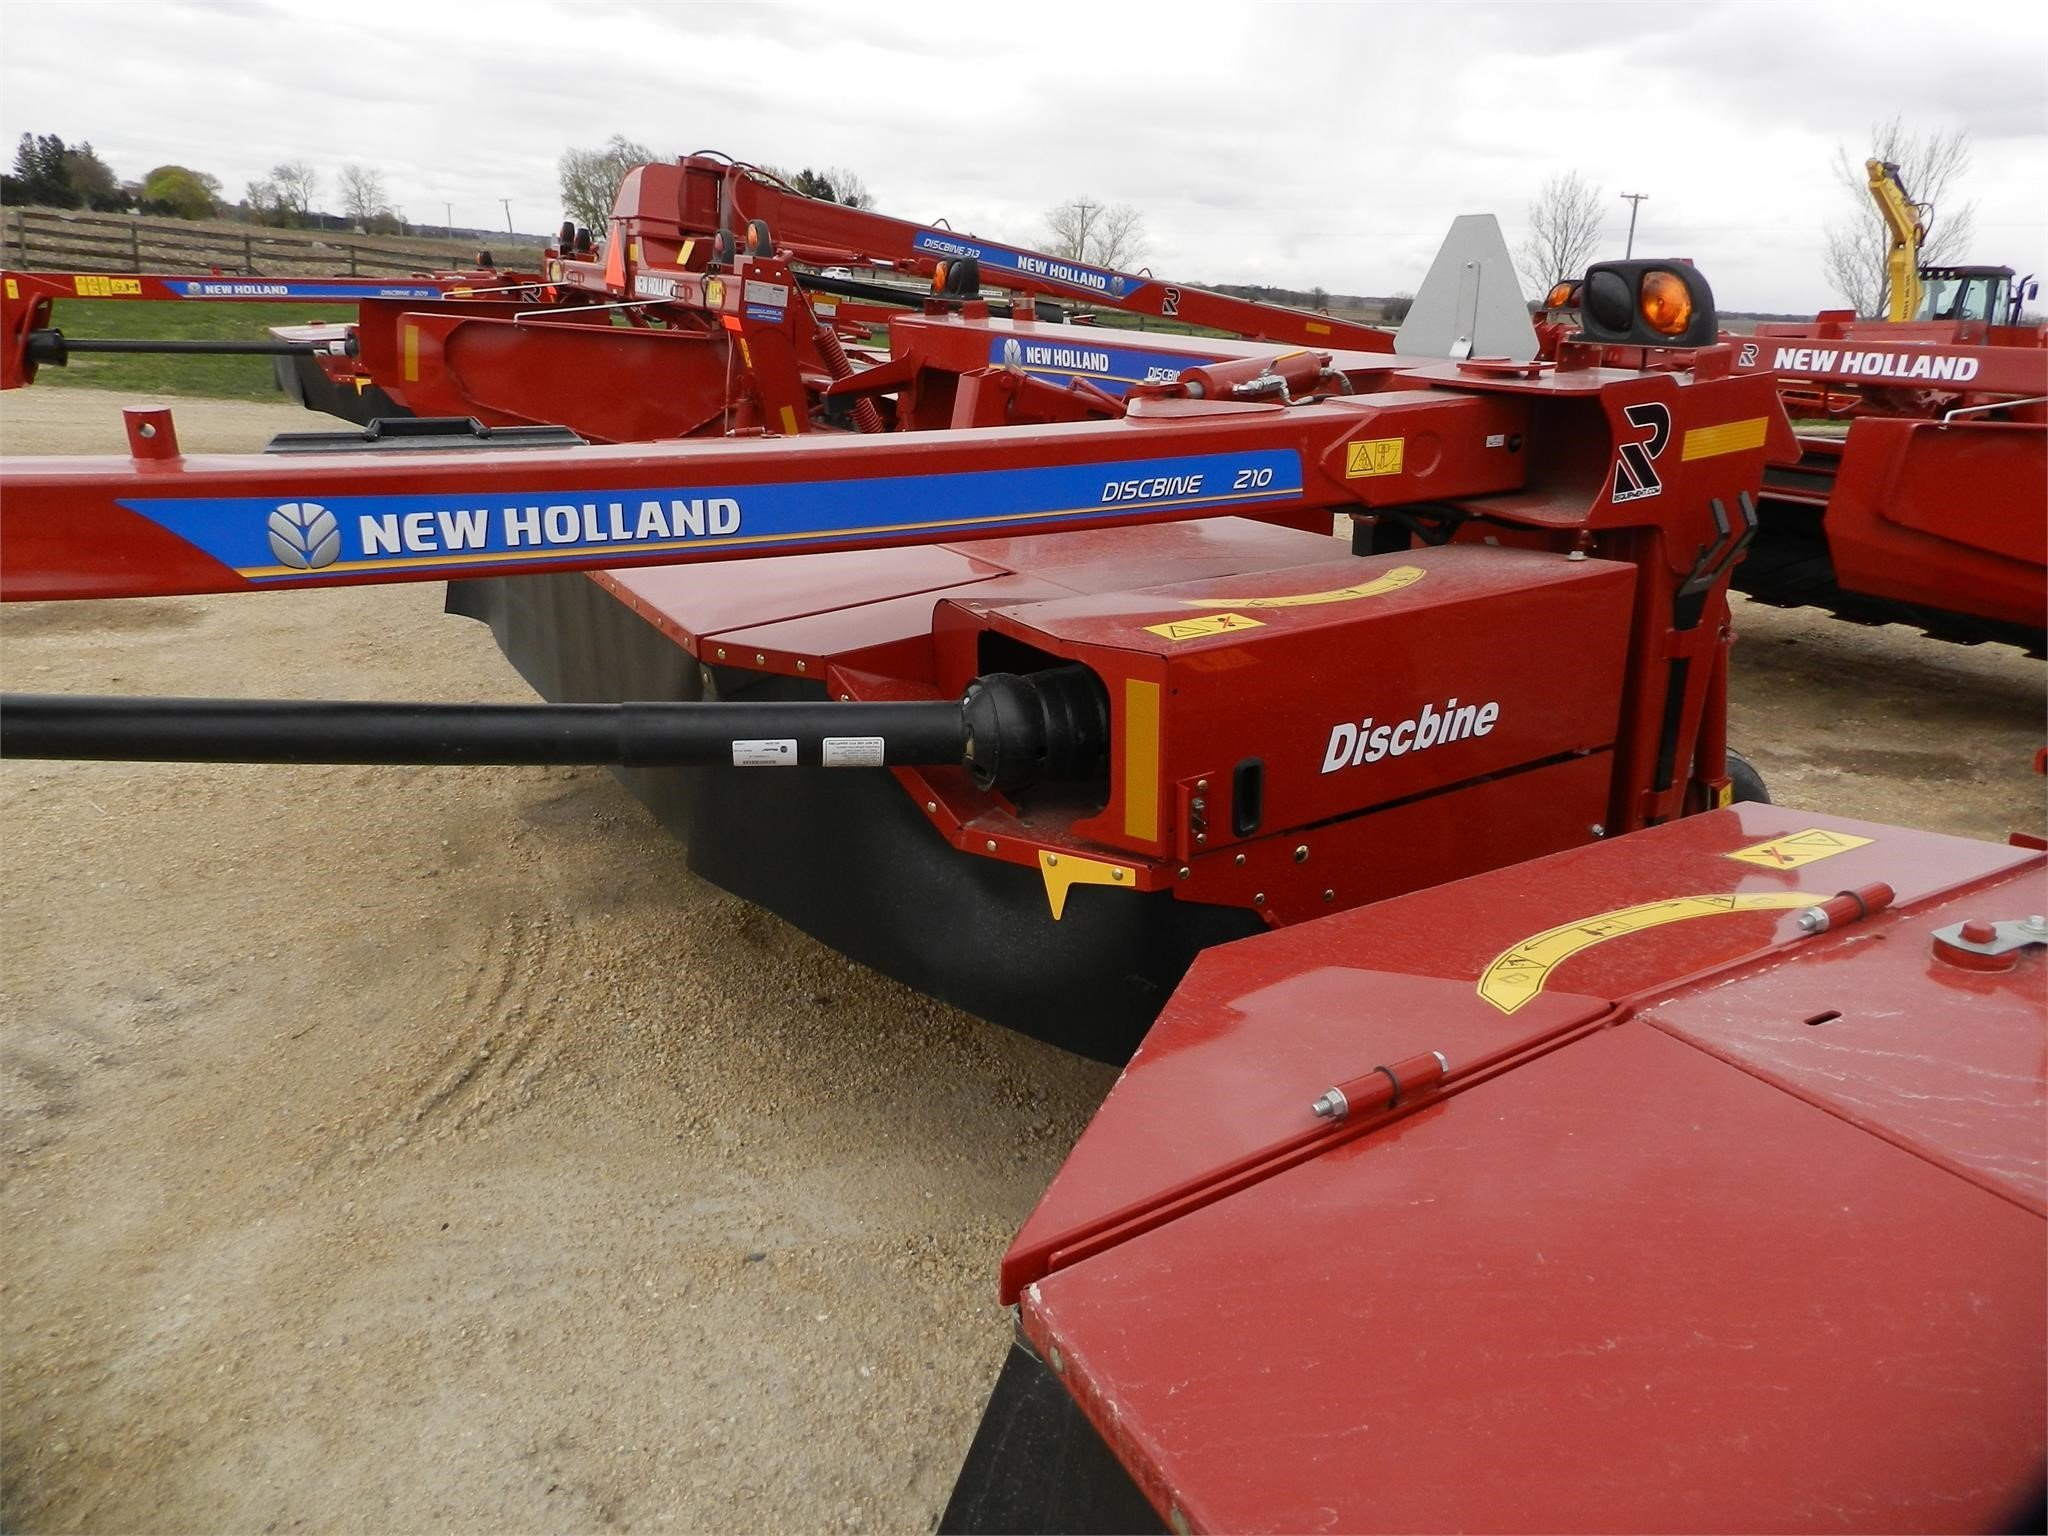 2021 New Holland 210 Manure Spreader